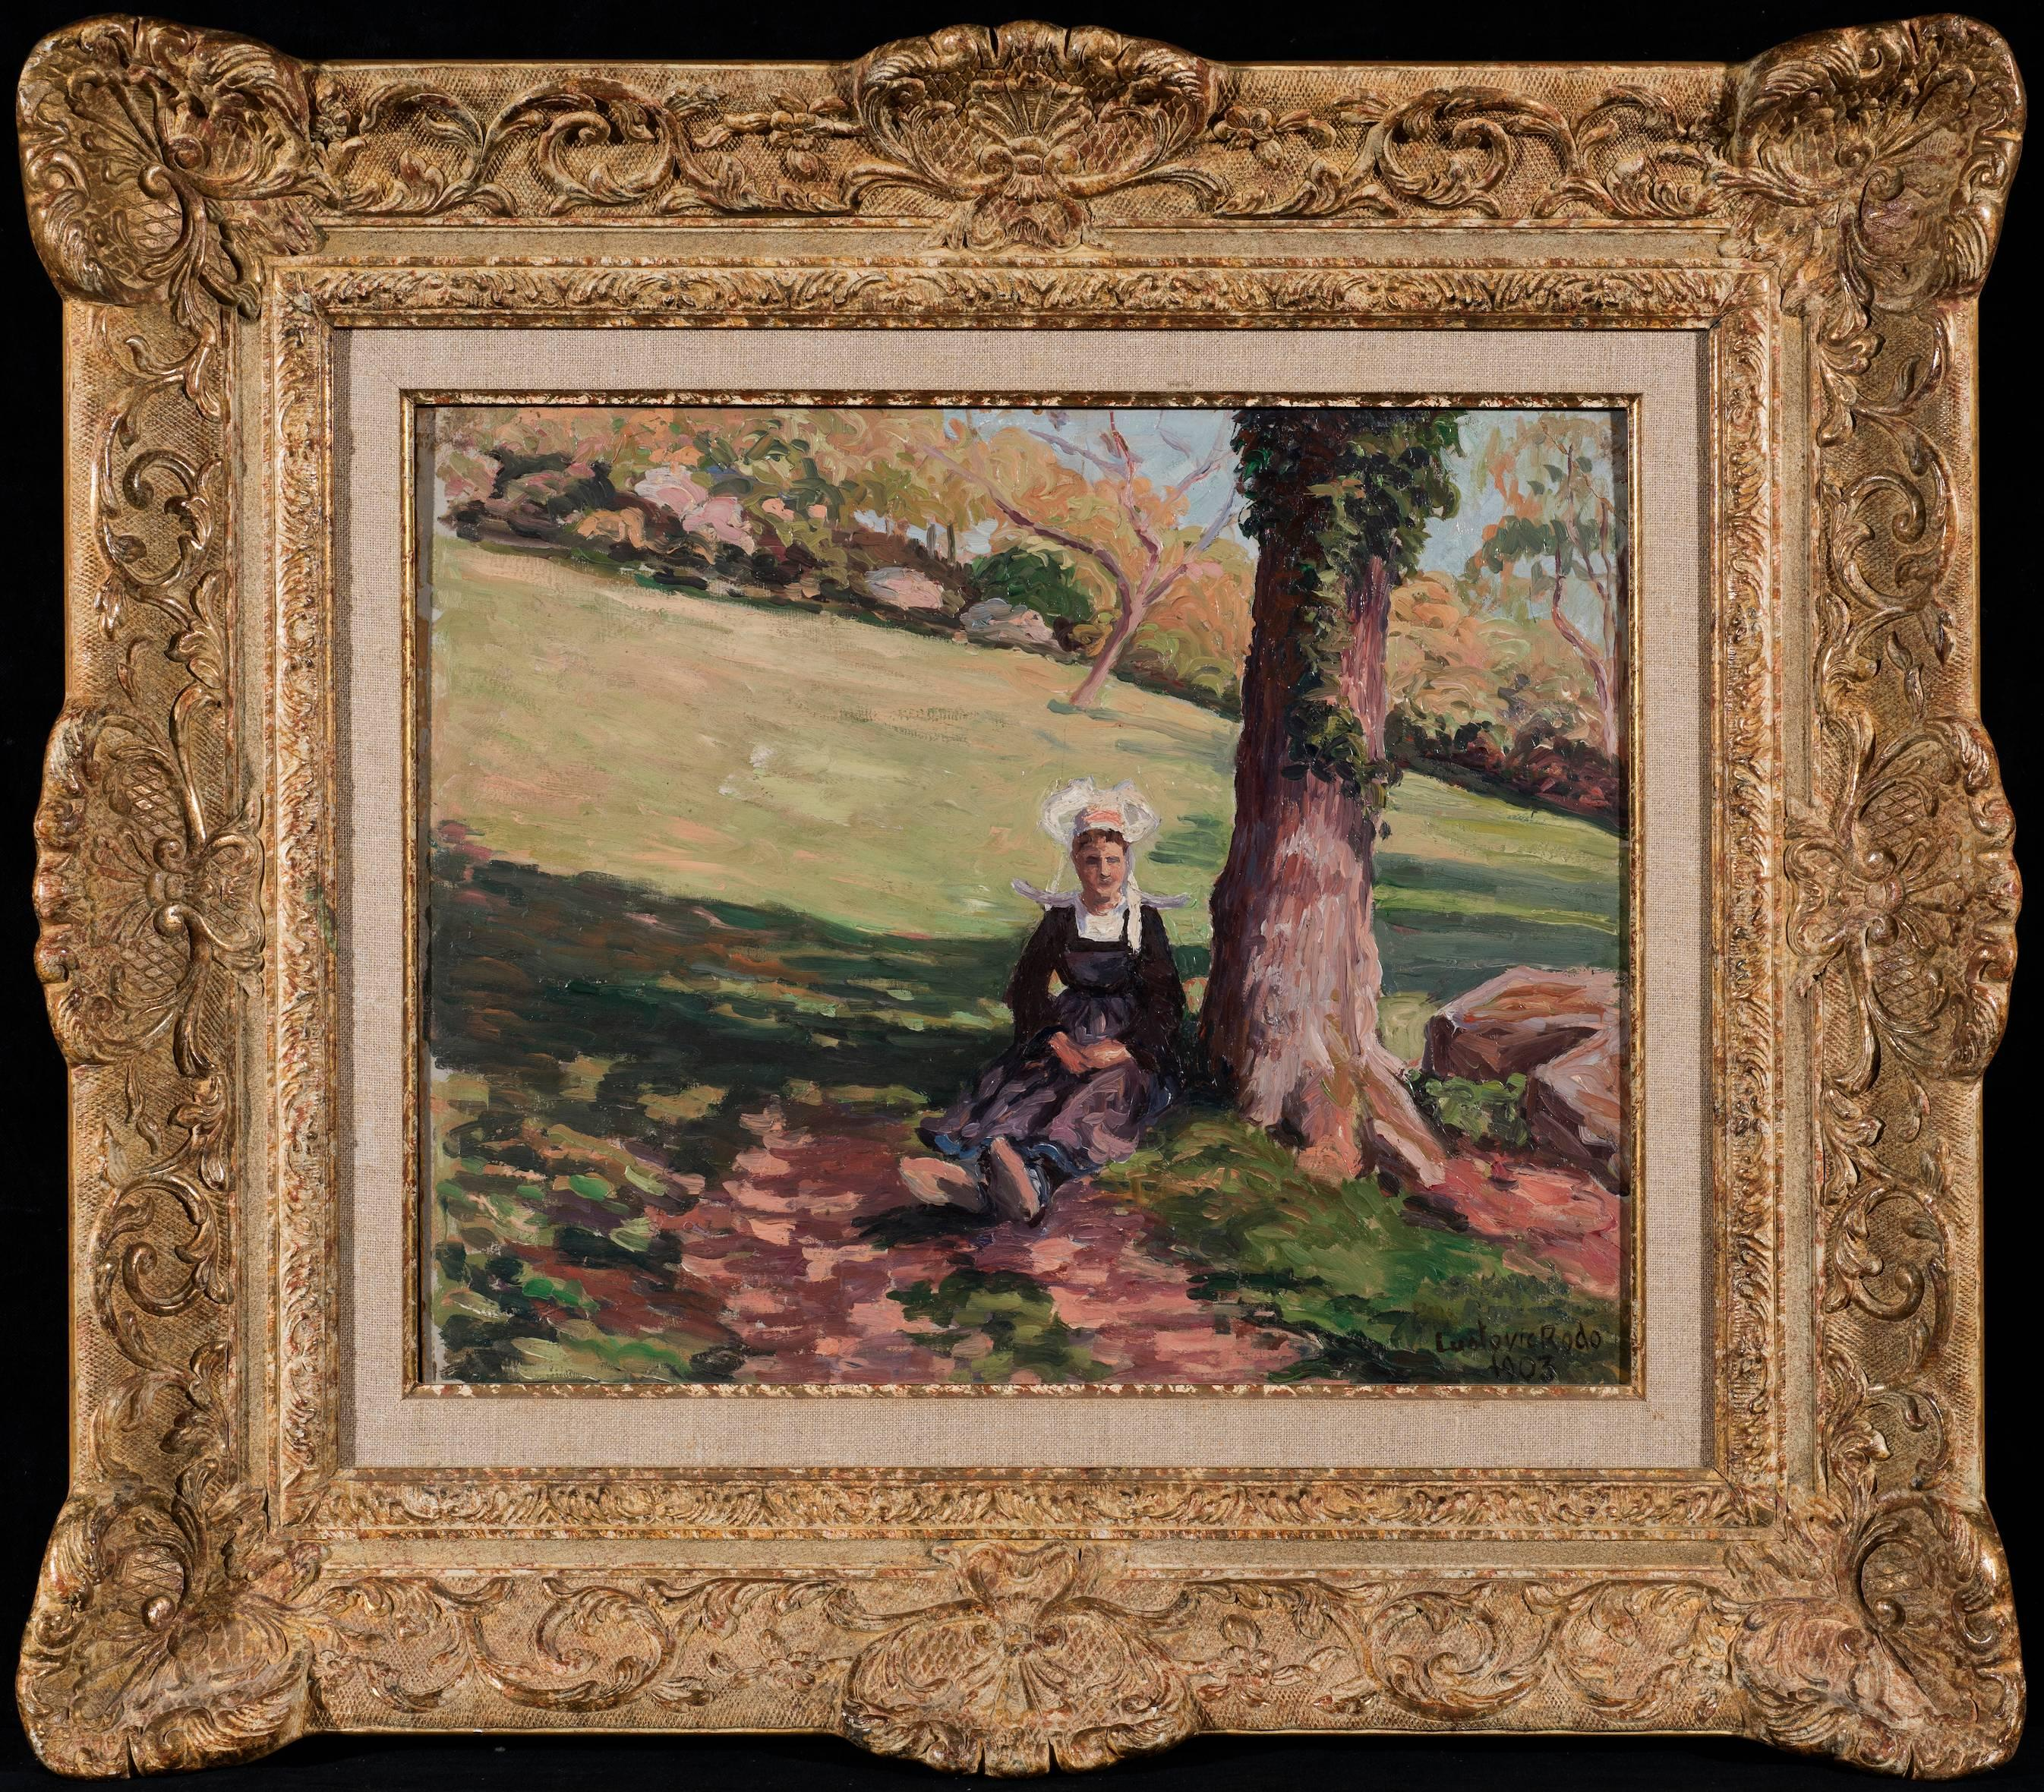 Bretonne sous un Arbre by LUDOVIC RODO PISSARRO - Post Impressionist painting